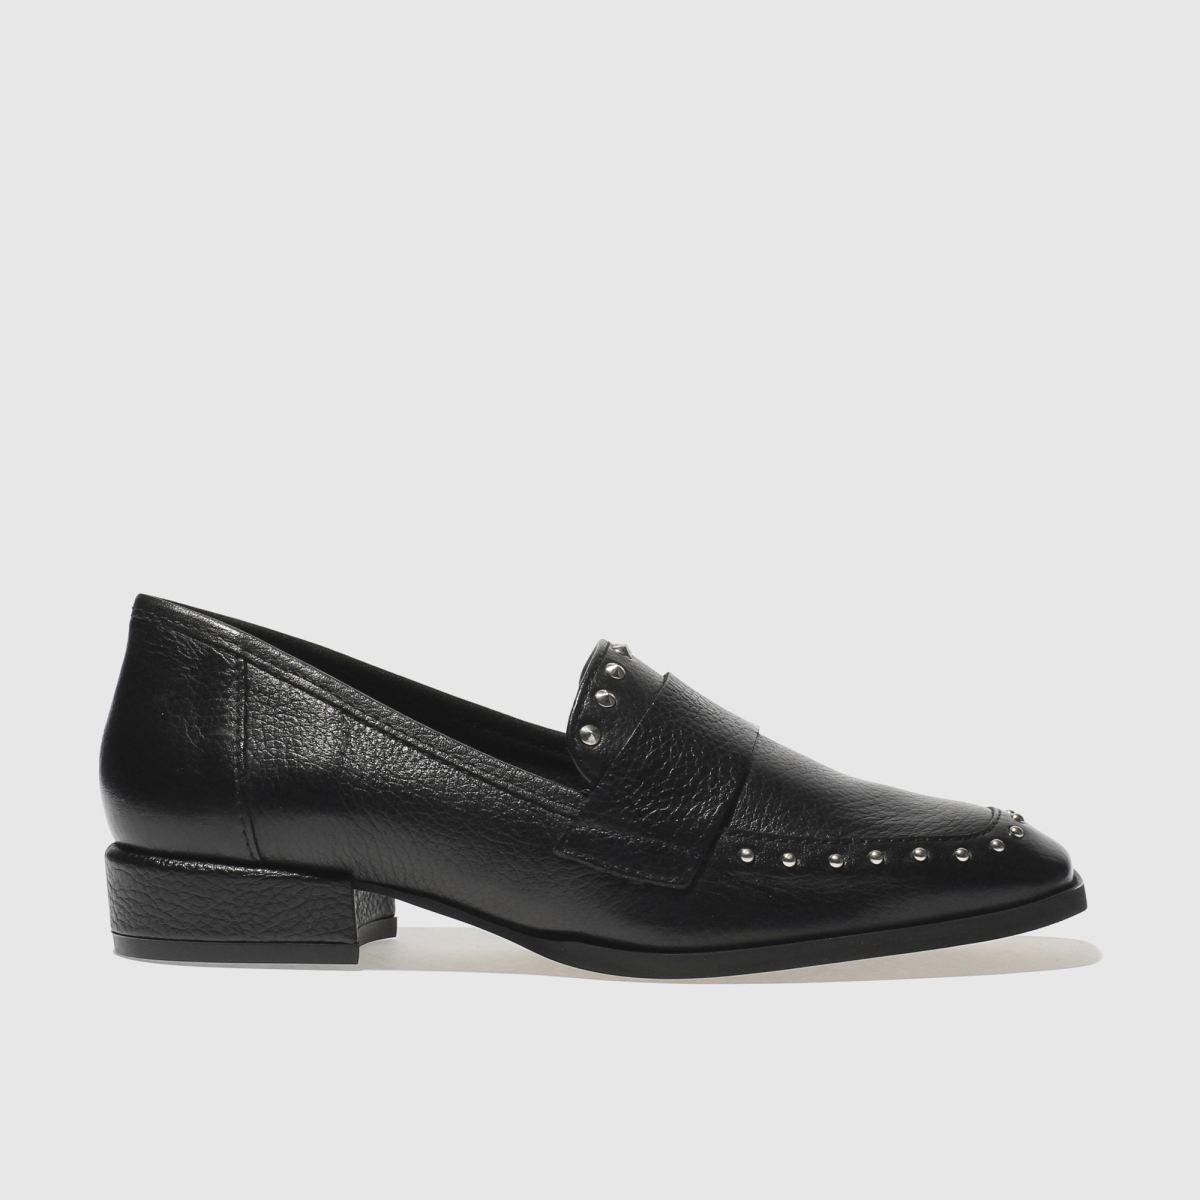 schuh black believe flat shoes